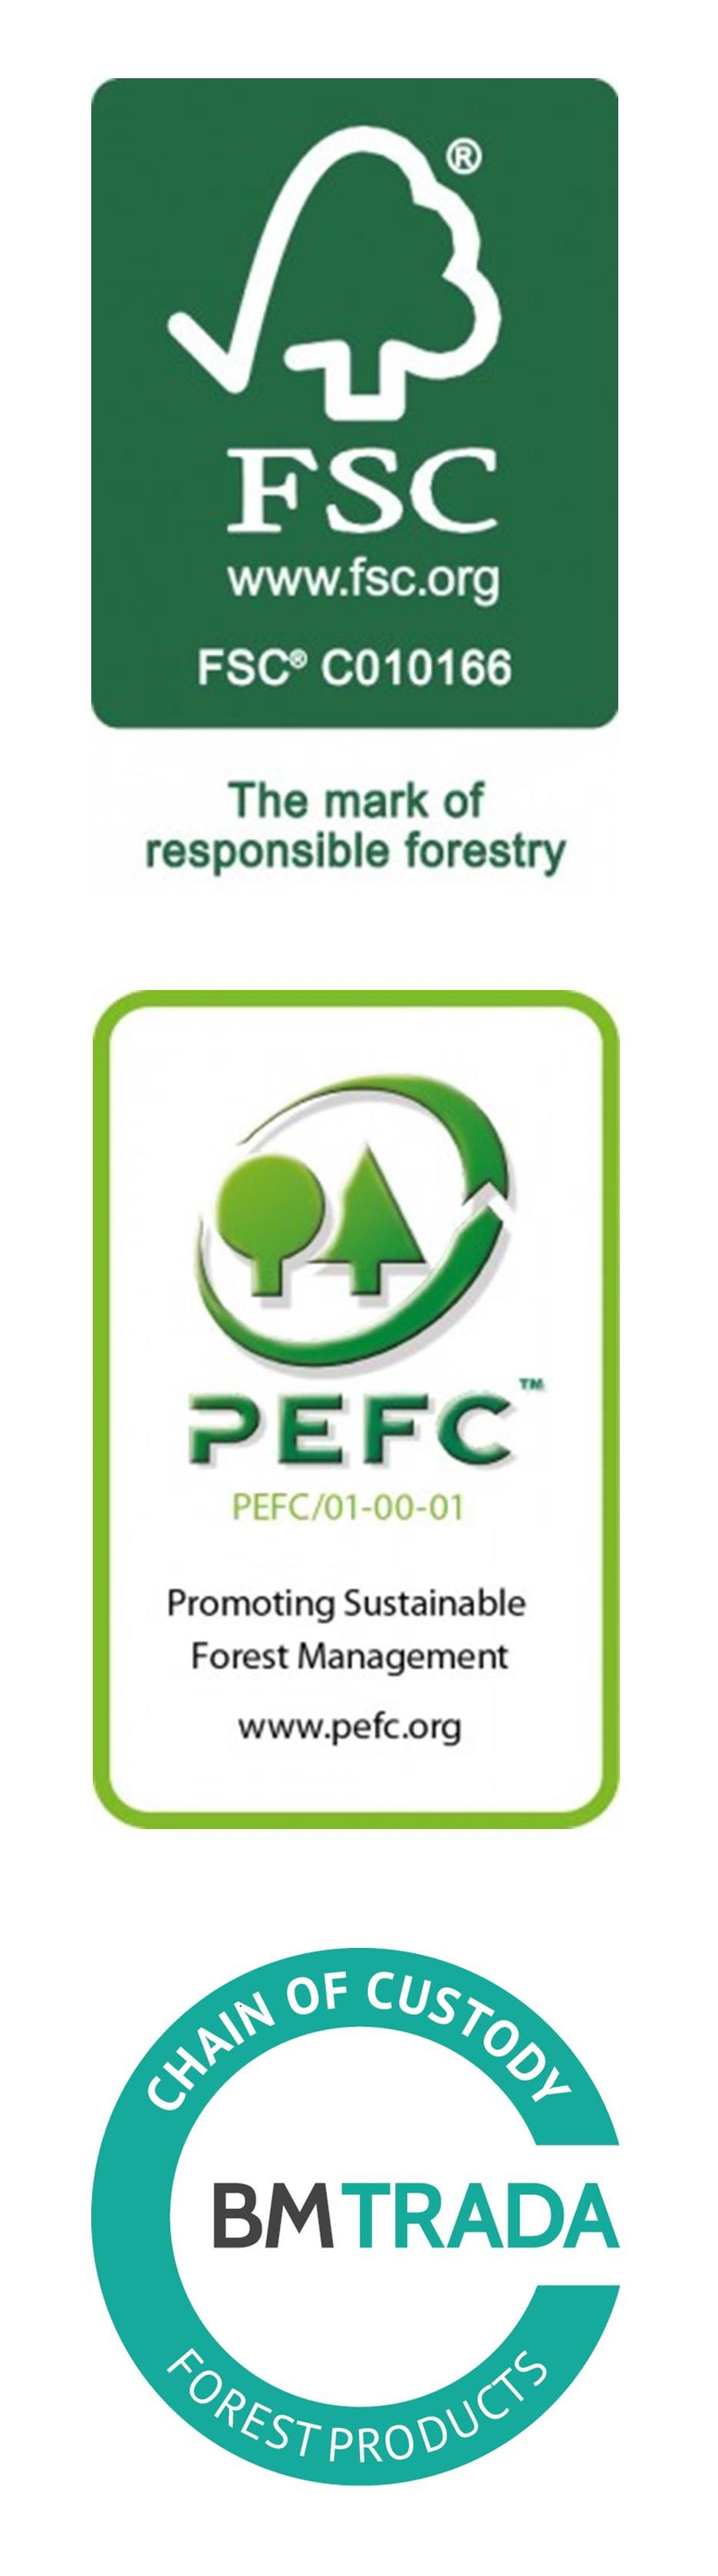 FSC, PEFC & Forest Products Logos - Portrait